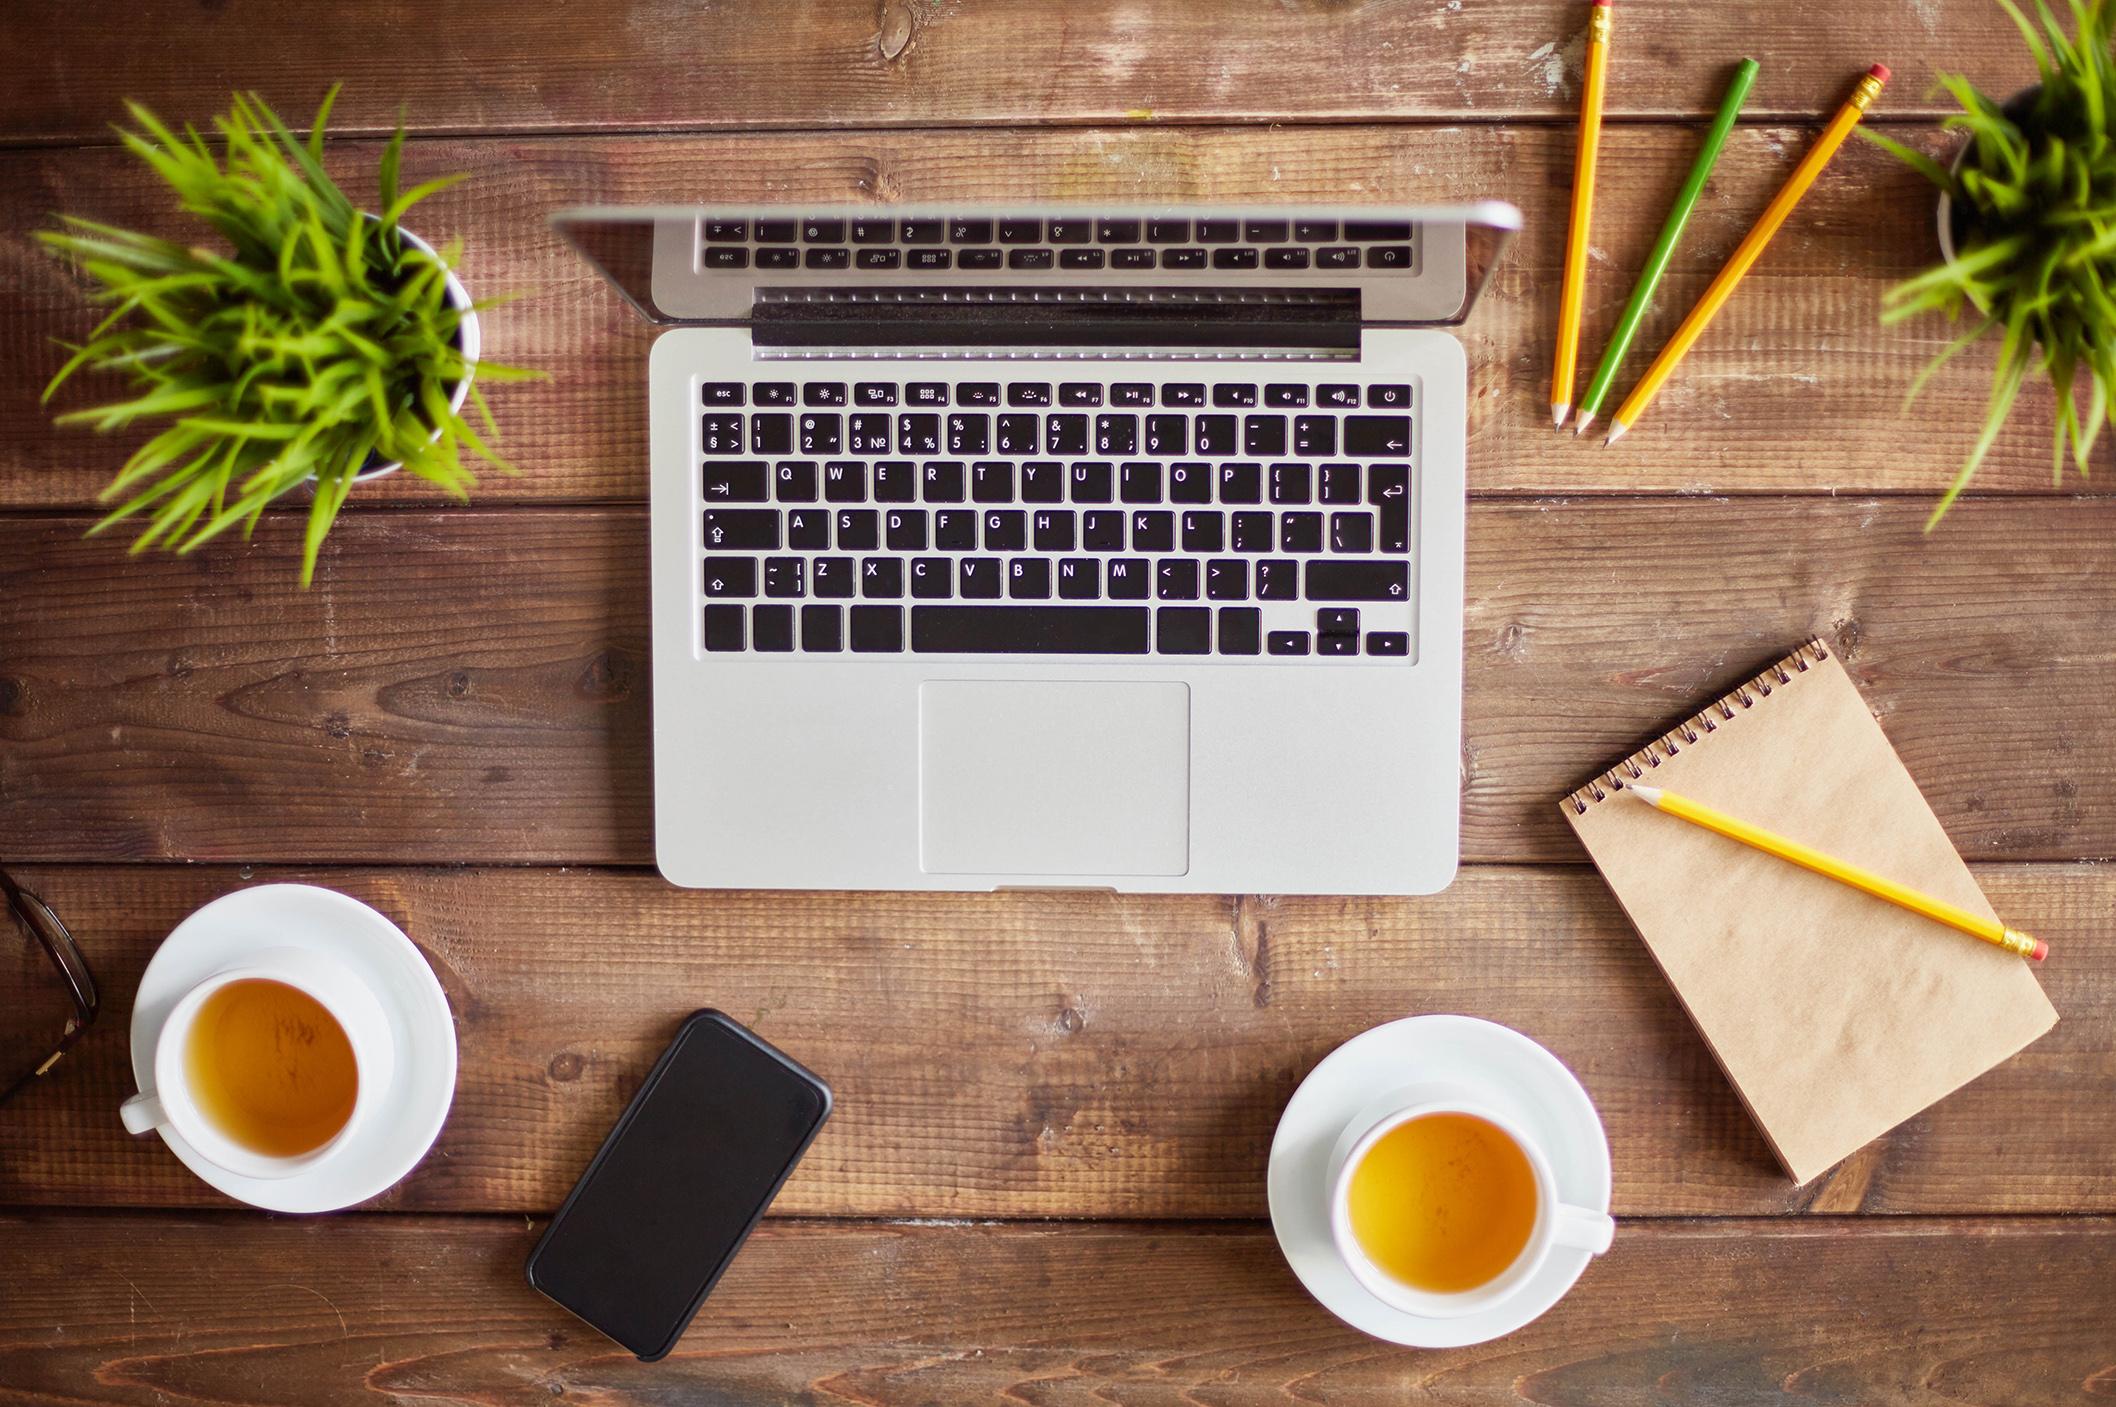 Pay Rent Online At Tresa at Arrowhead Apartments In Glendale AZ